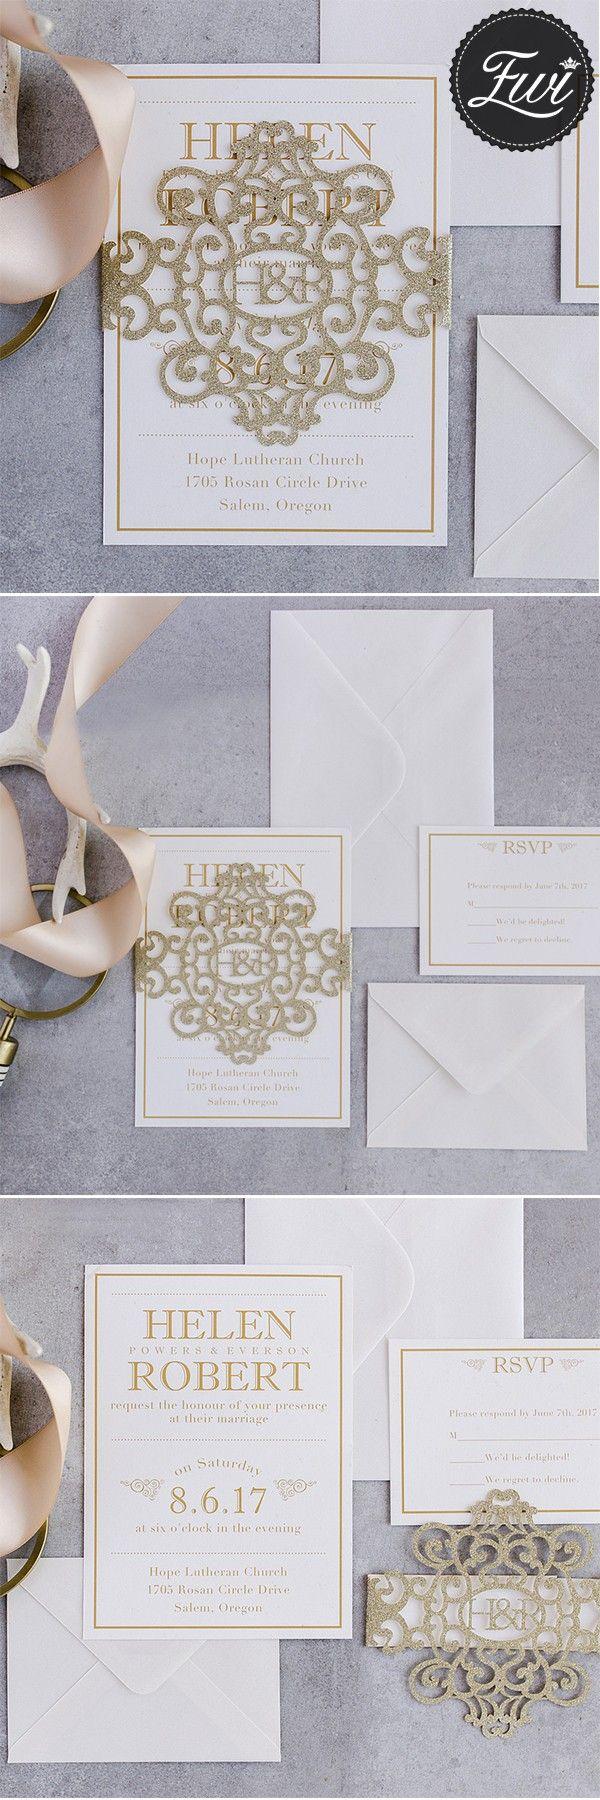 reception information on back of wedding invitation%0A modern gold glitter monogram laser cut belly band wedding invitations  EWBLG